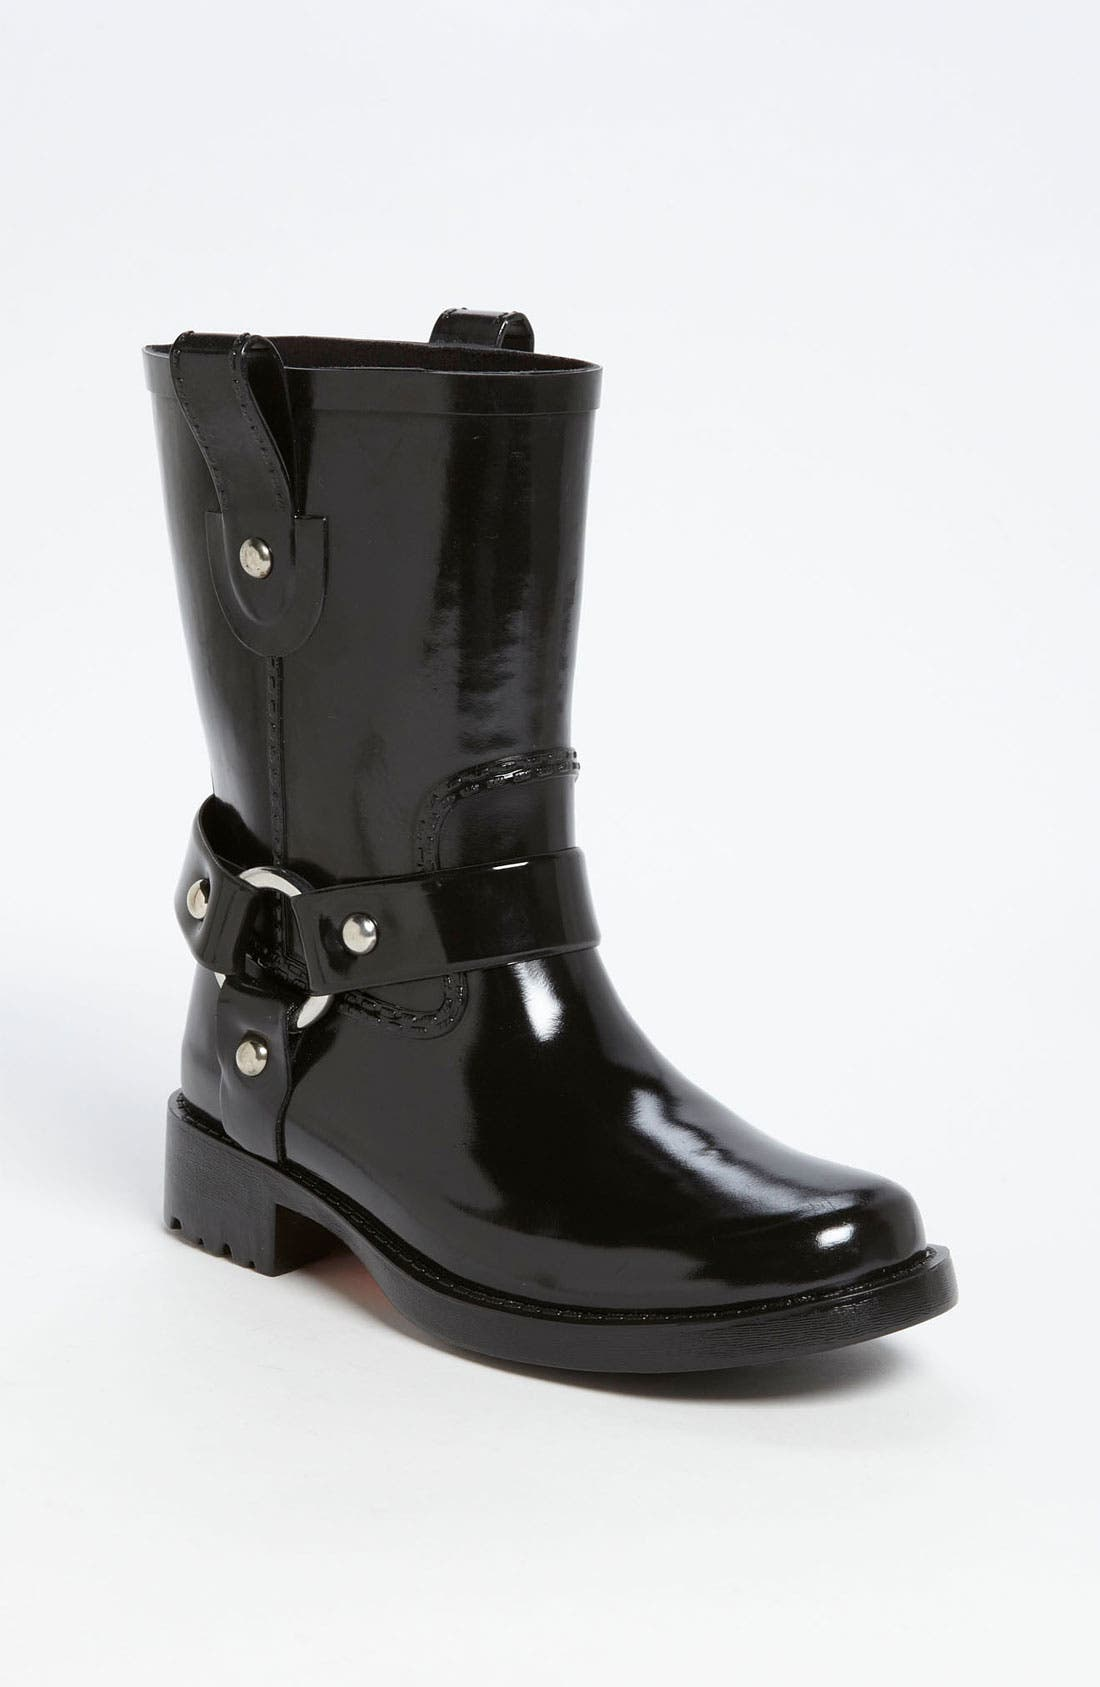 Alternate Image 1 Selected - KORS Michael Kors 'Stormette' Rain Boot (Women)